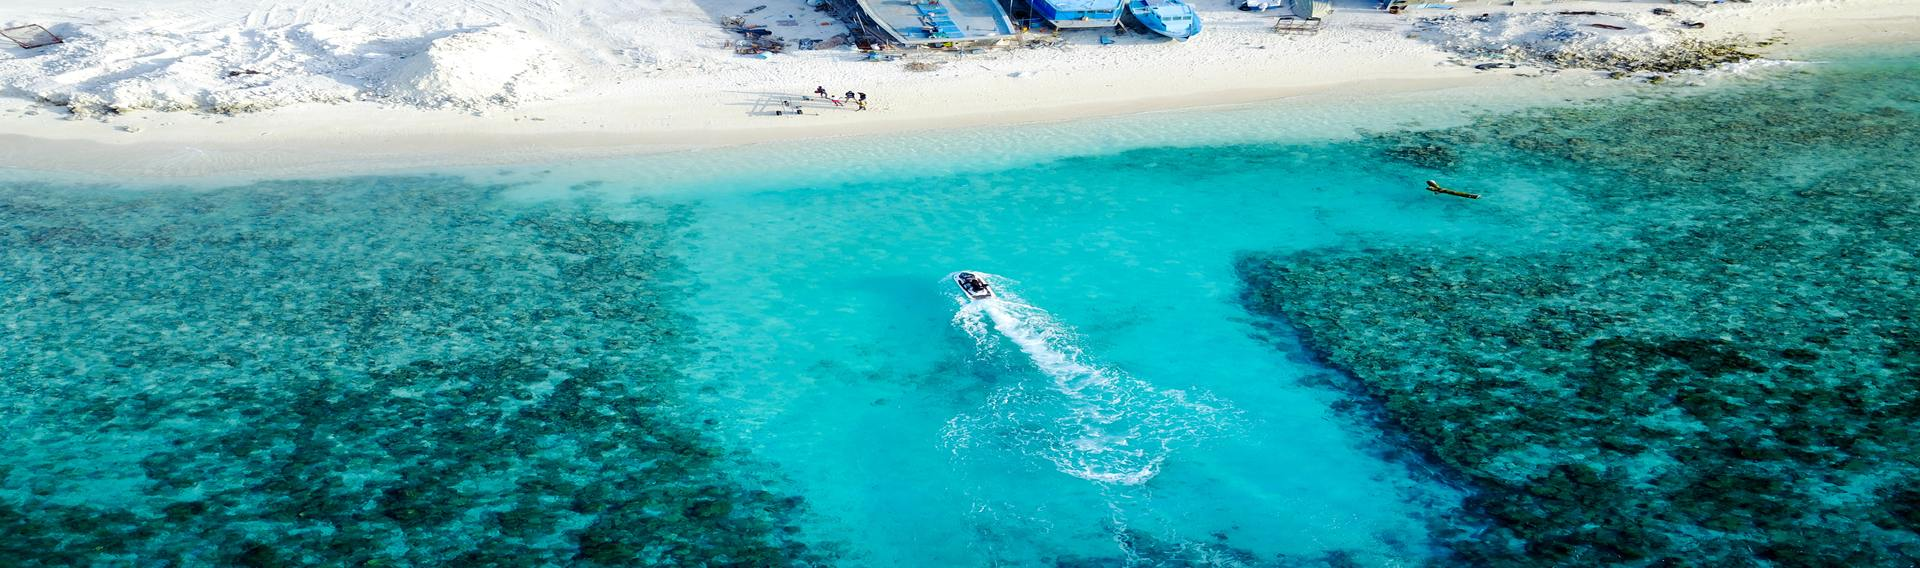 Maldives, transports